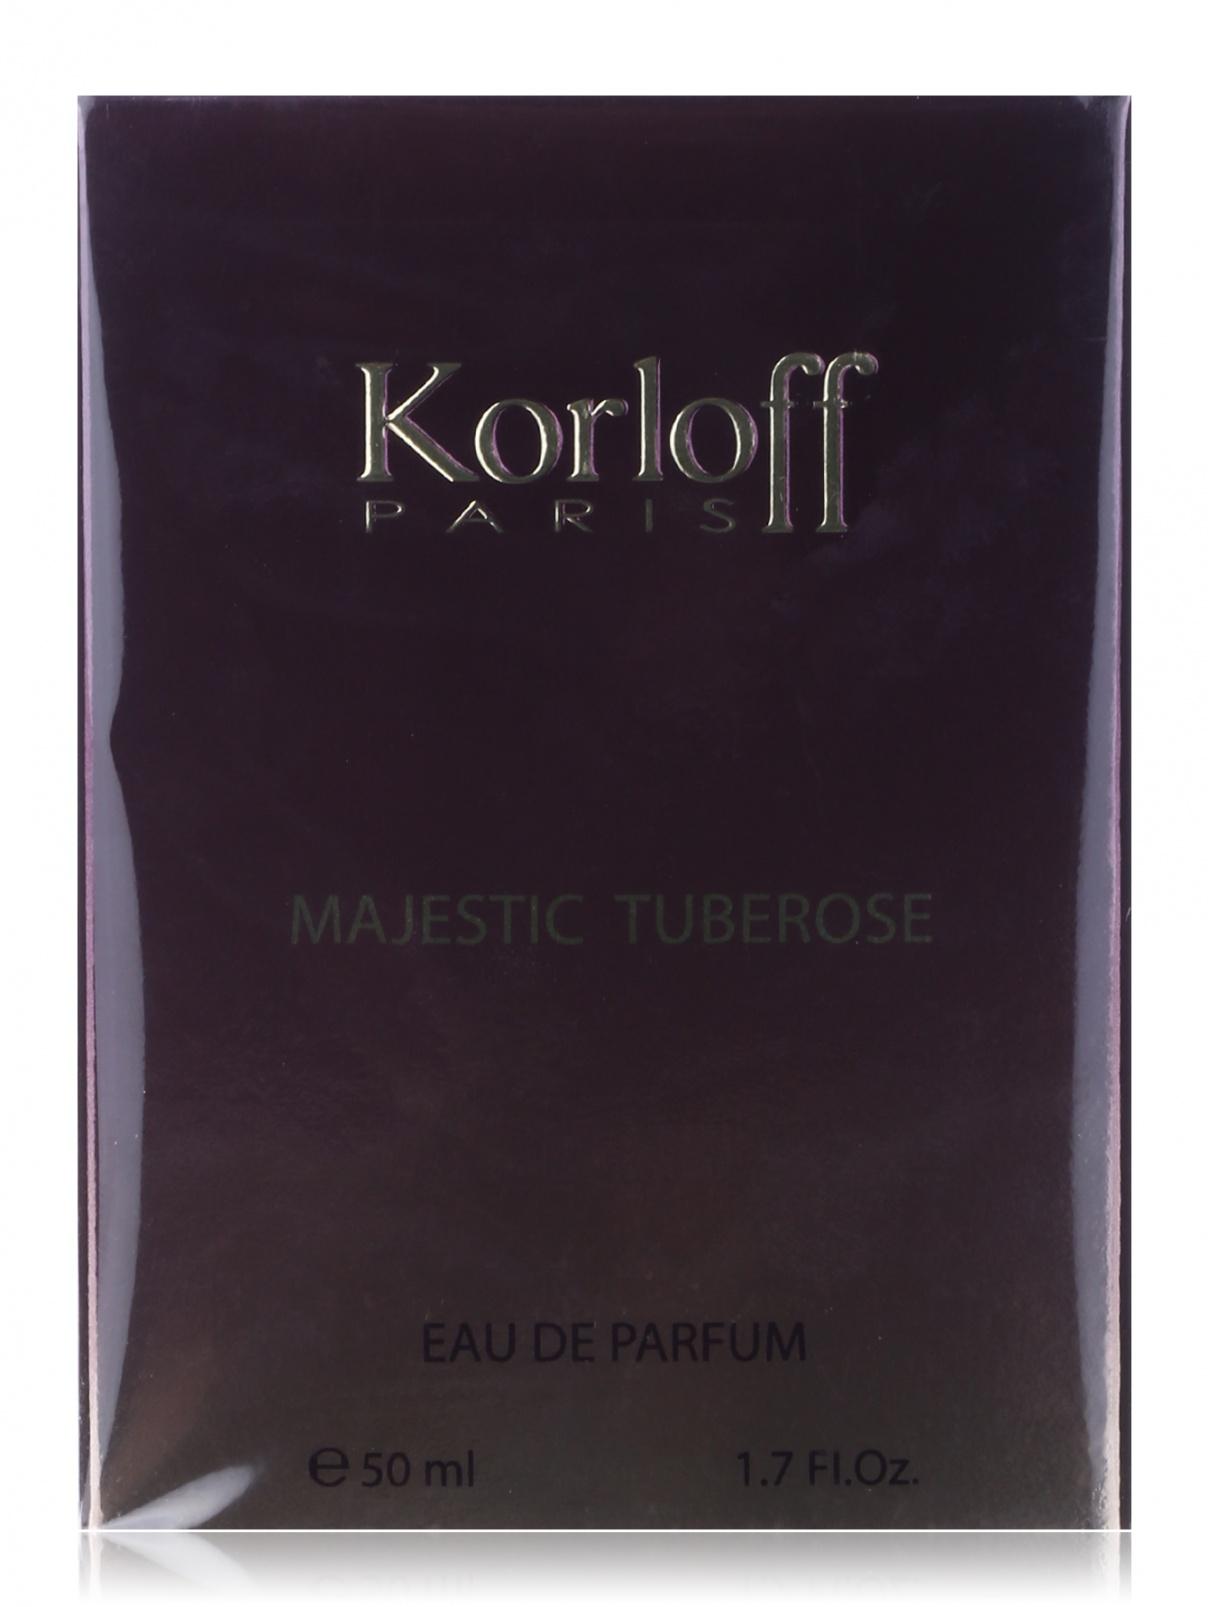 Туалетная вода - Majestic Tuberrose, 50ml Korloff  –  Модель Общий вид